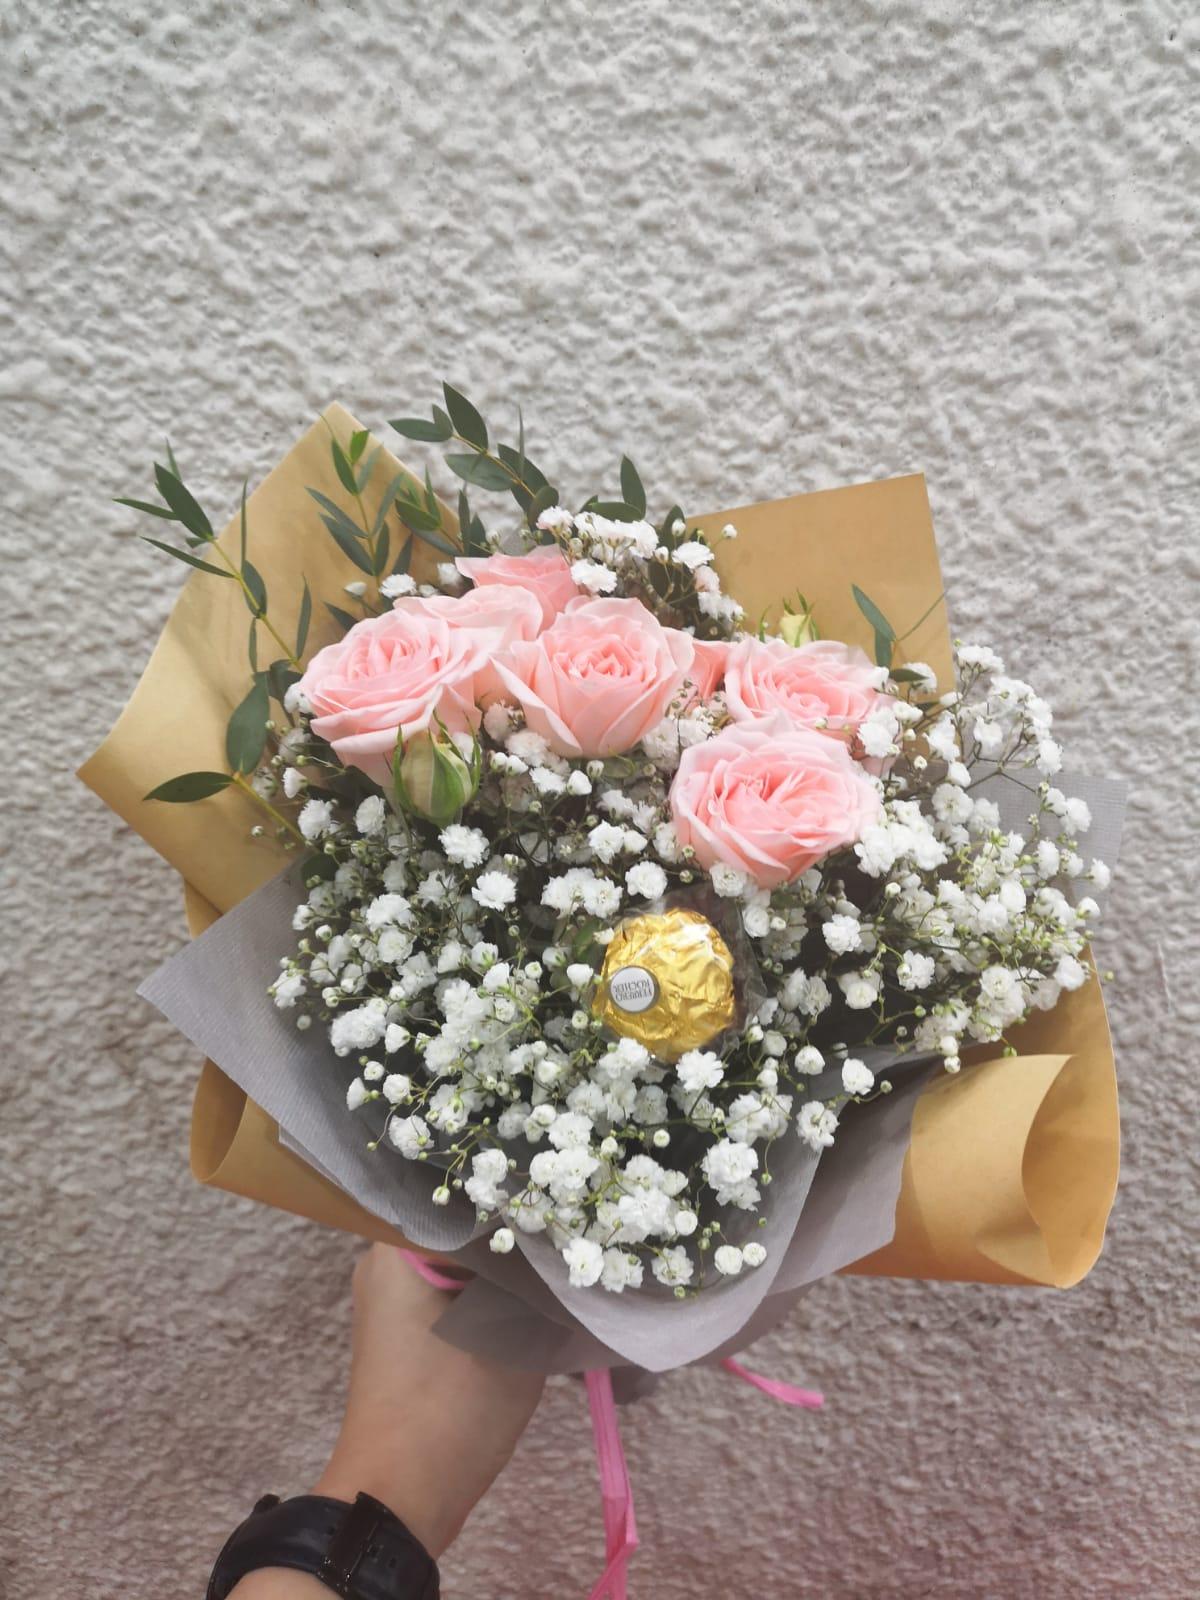 Kedua merupakan buket bunga wisuda flanel yang berwarna kuning serta abu.